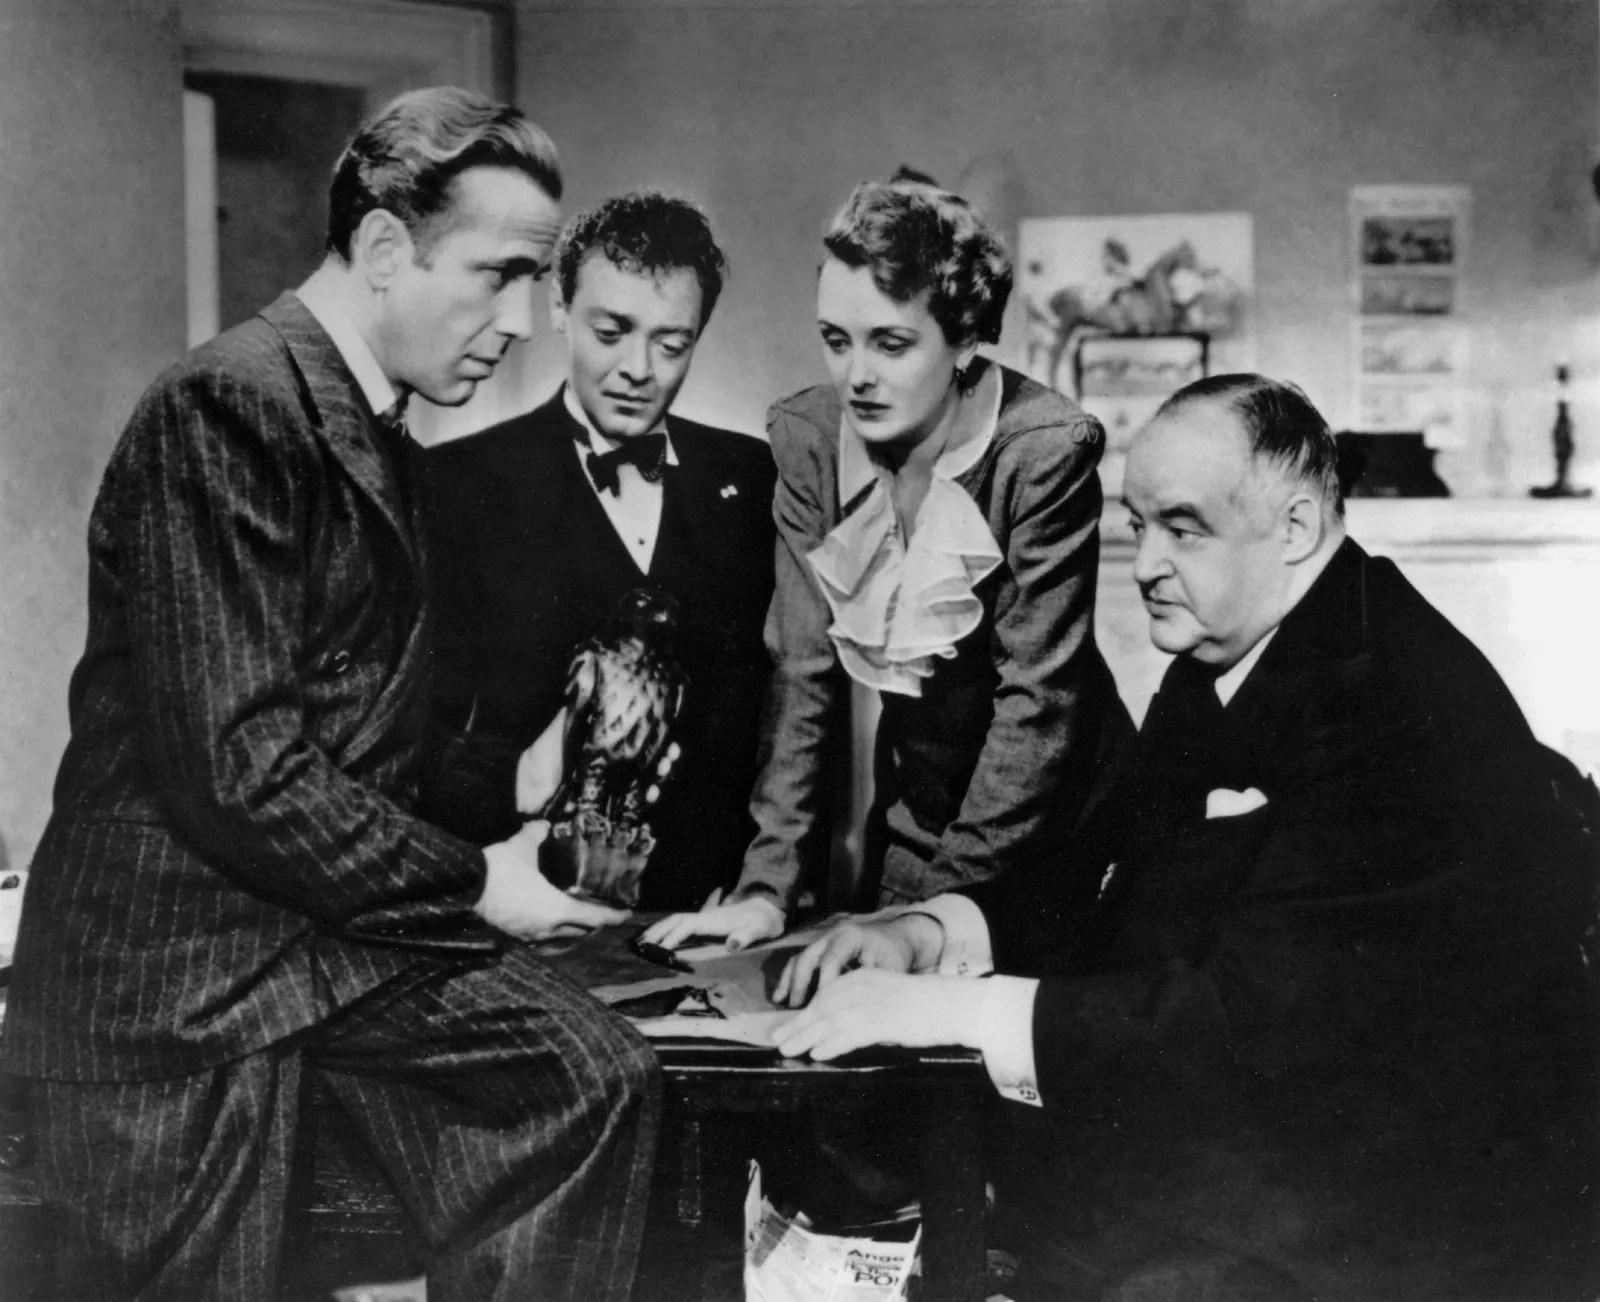 https://i2.wp.com/cdn.britannica.com/59/102859-050-599C5142/Humphrey-Bogart-Sam-Spade-Peter-Lorre-film-1941.jpg?ssl=1